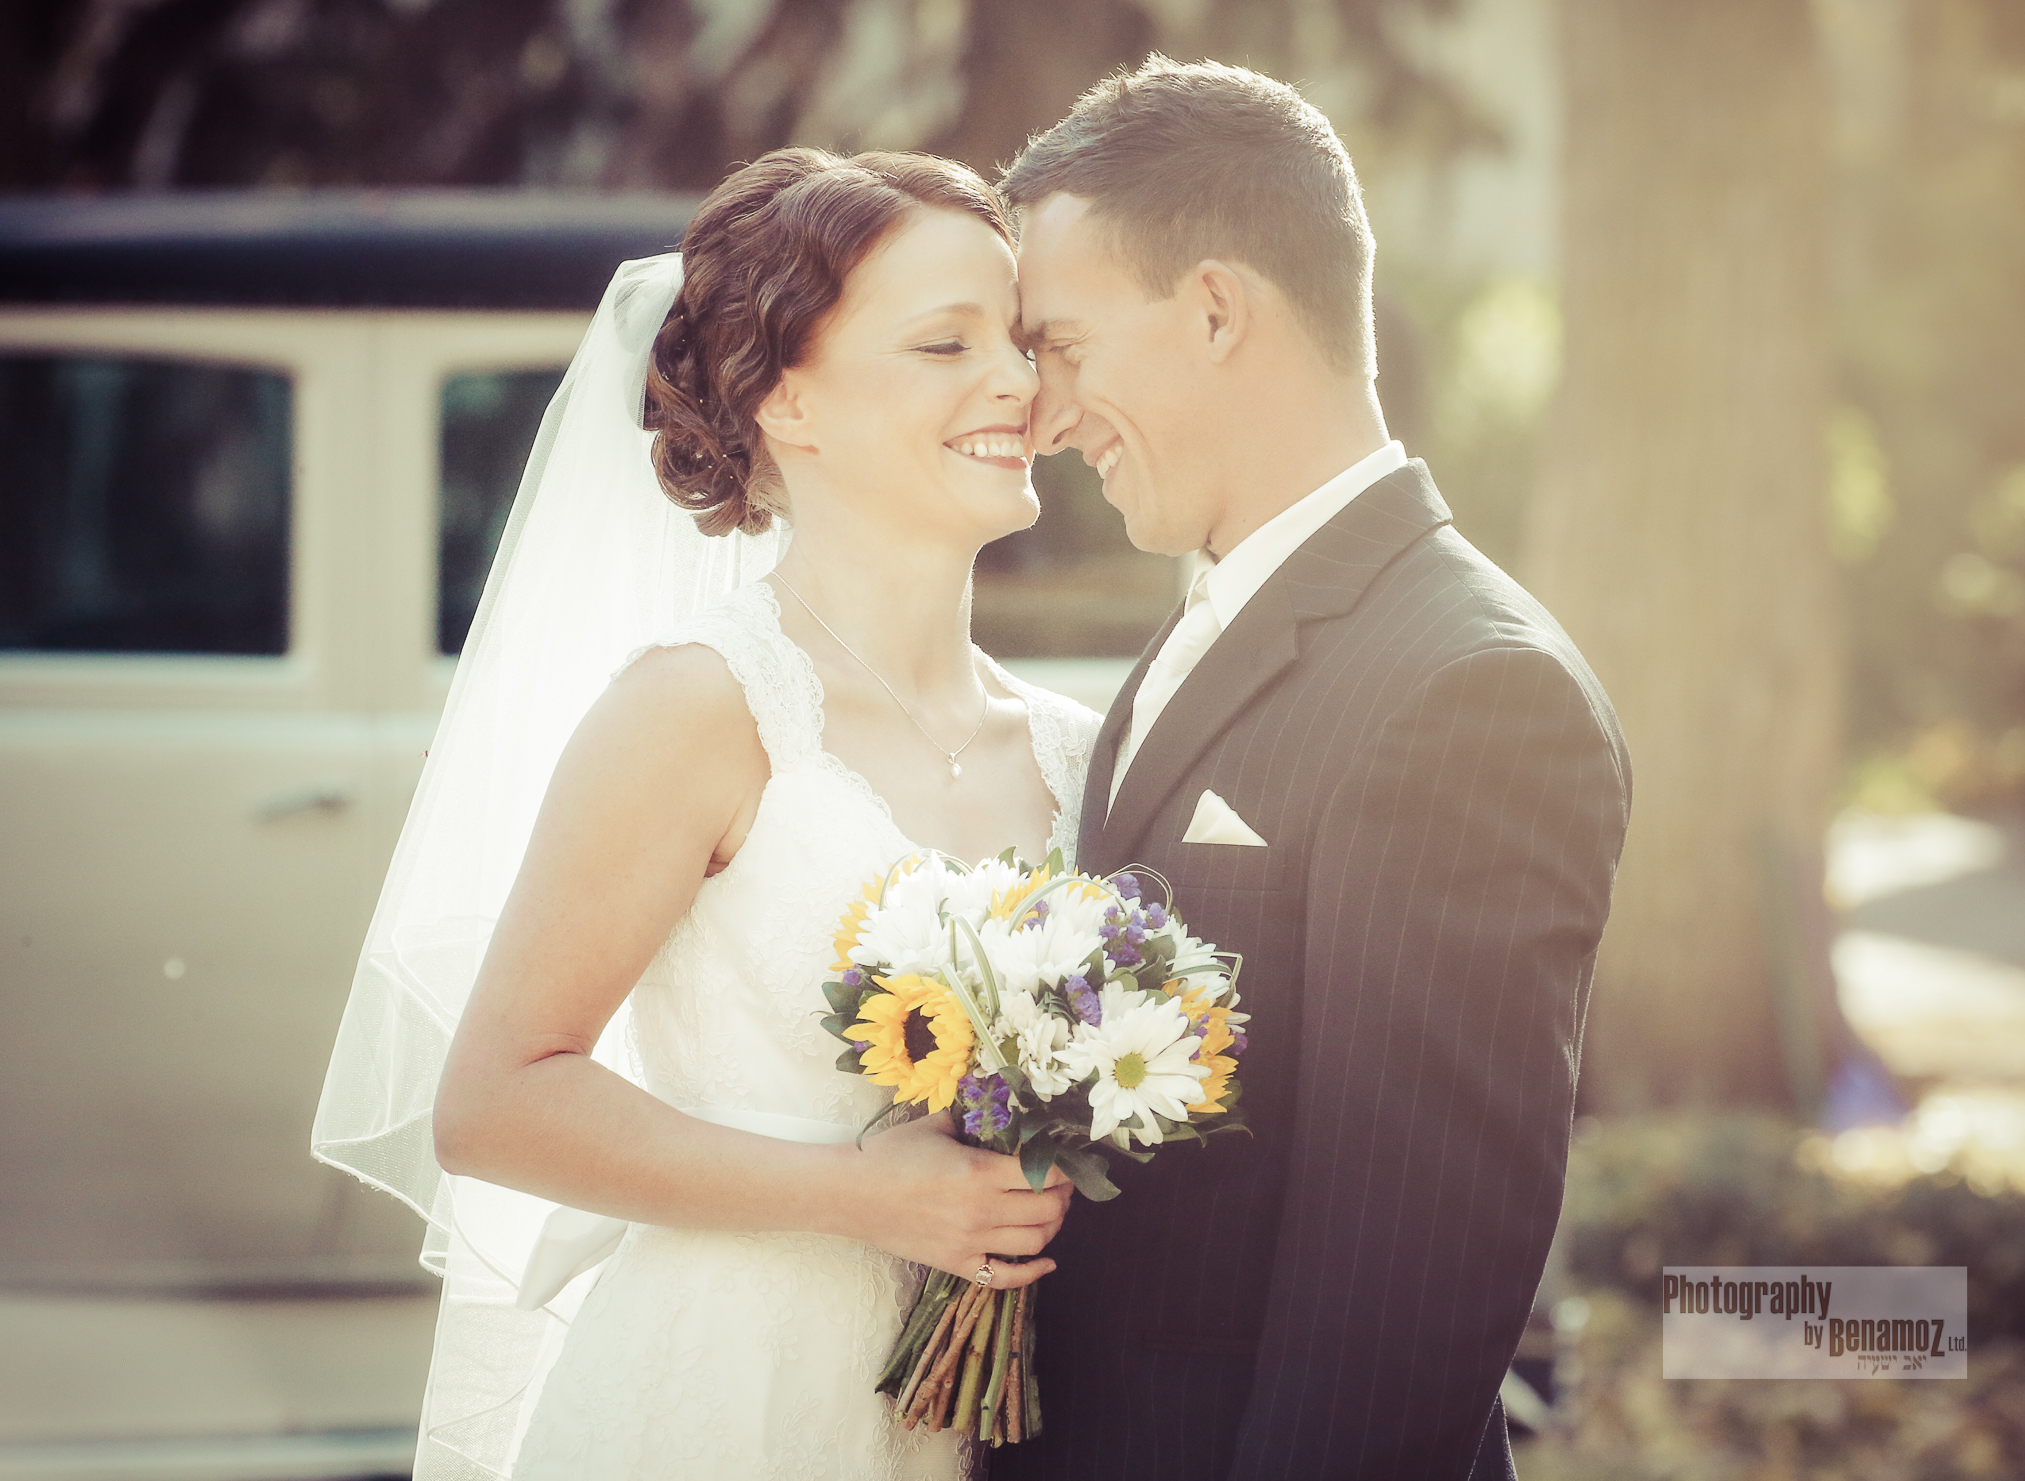 christine-cory-wedding-portraits-94.jpg